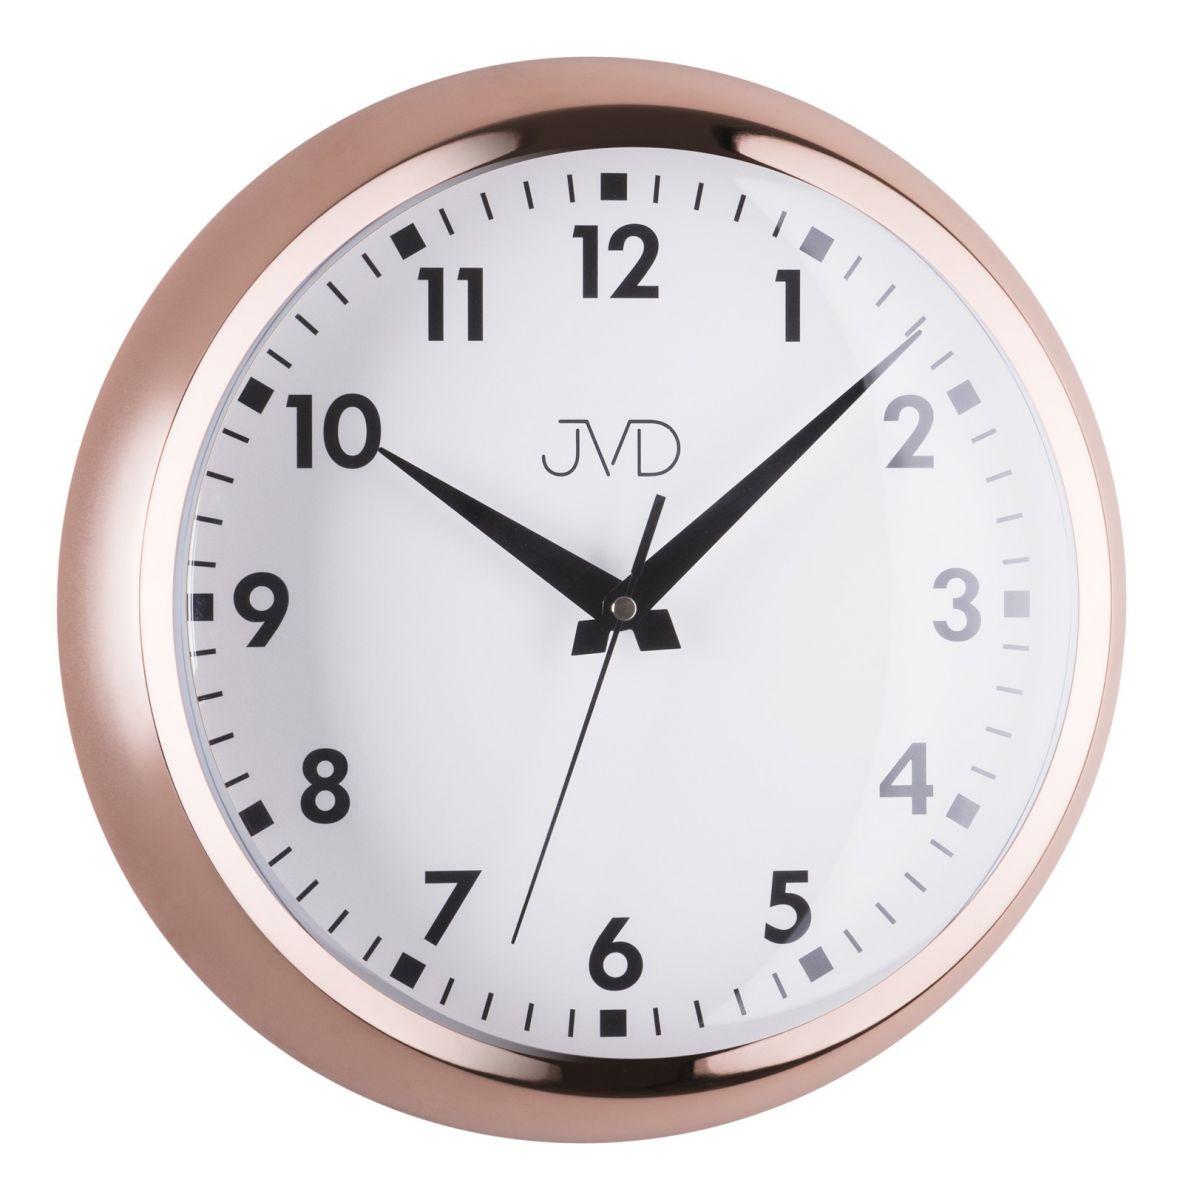 Designové chromové kovové hodiny JVD HT077.1 (barva růžového zlata)